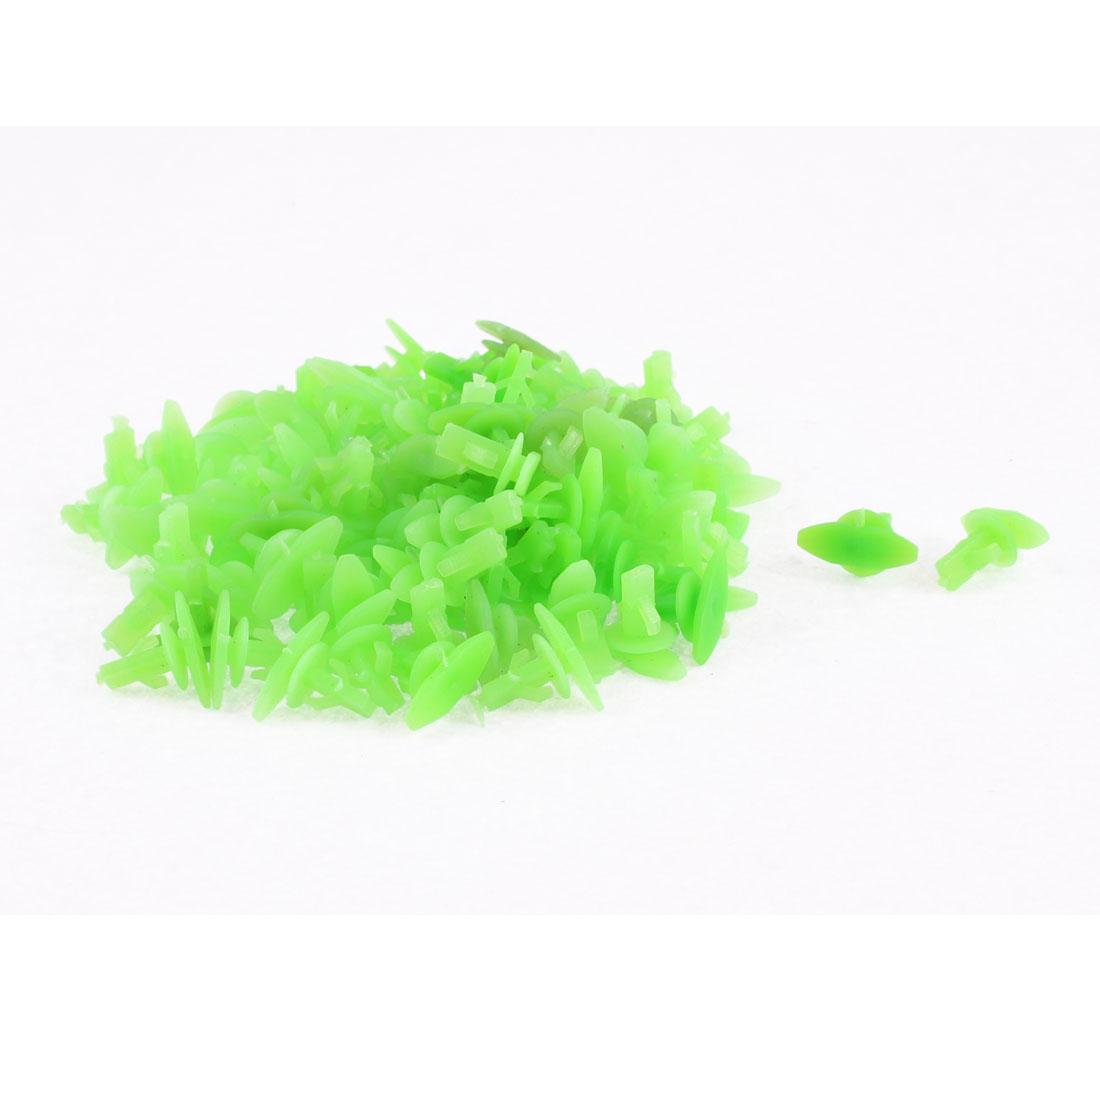 6mm Hole Plastic Rivets Fastener Clips Green 100Pcs